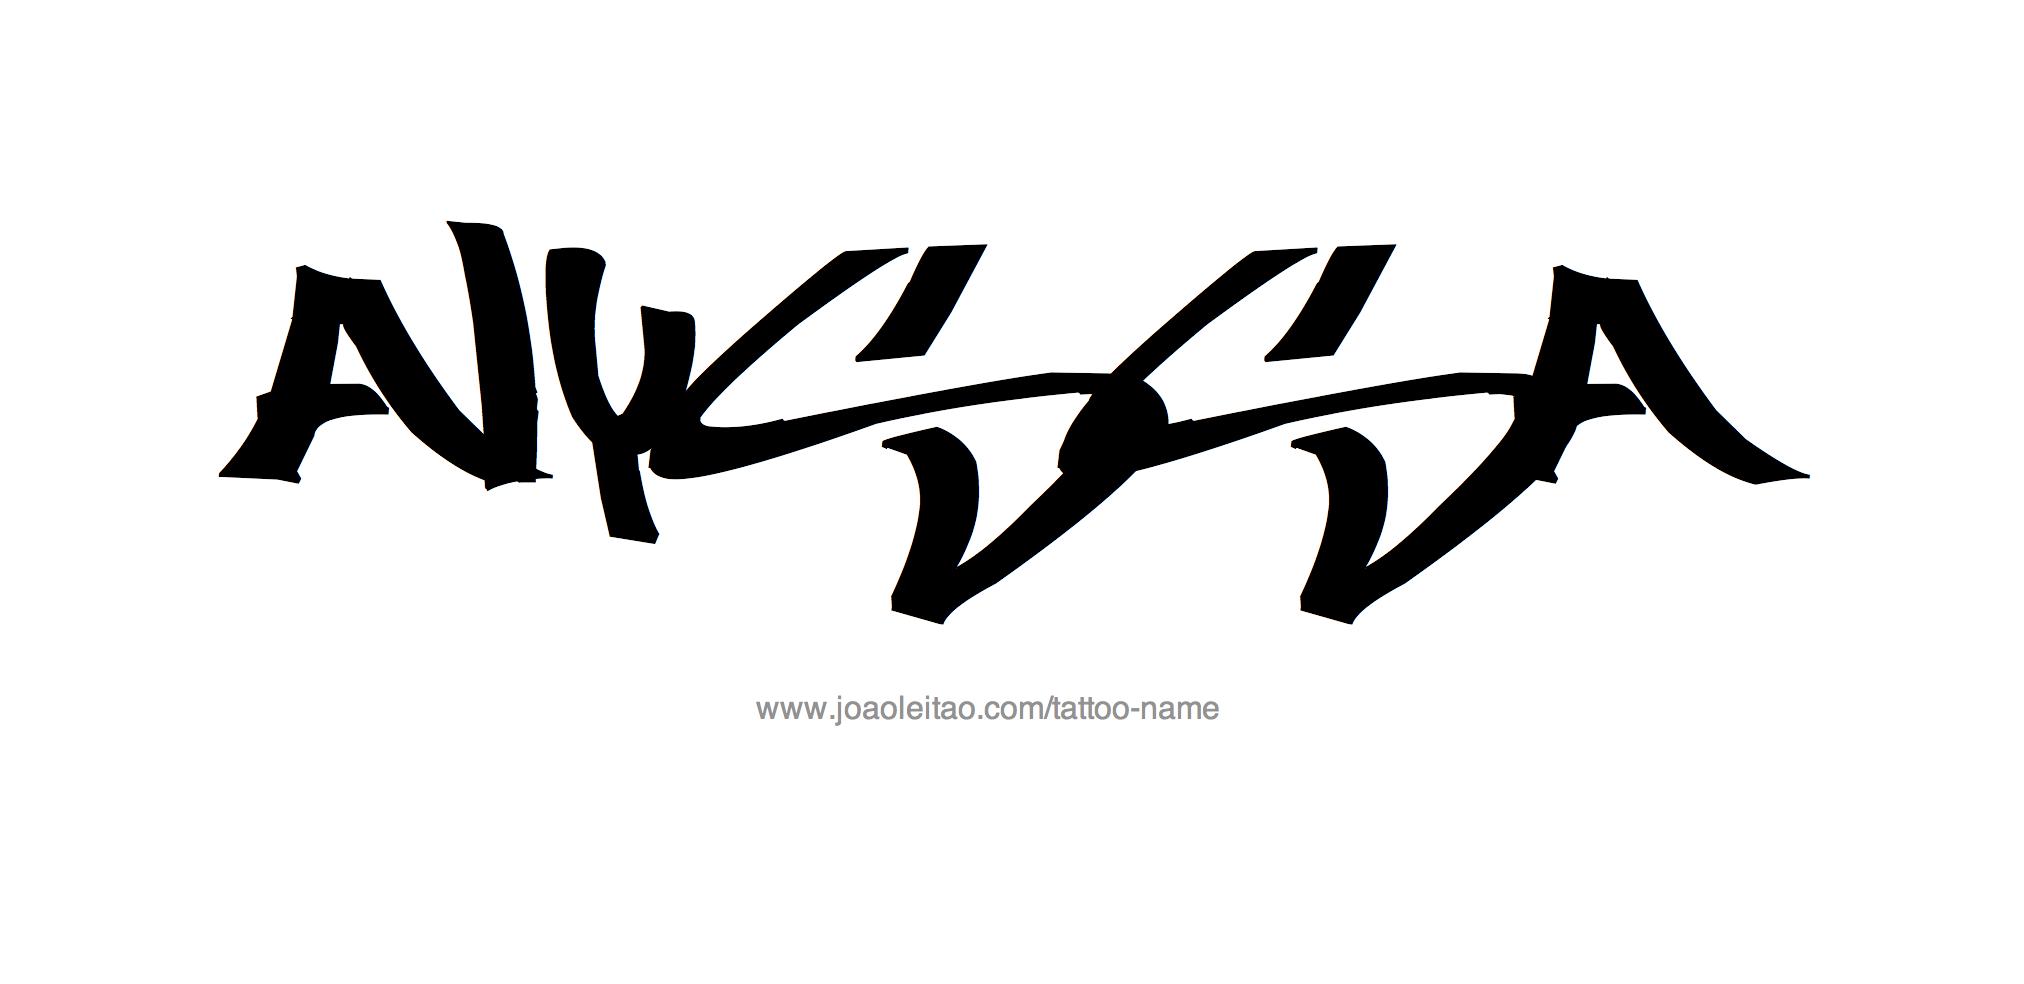 Alyssa Name Tattoo Designs | Name tattoos, Tattoo designs ...